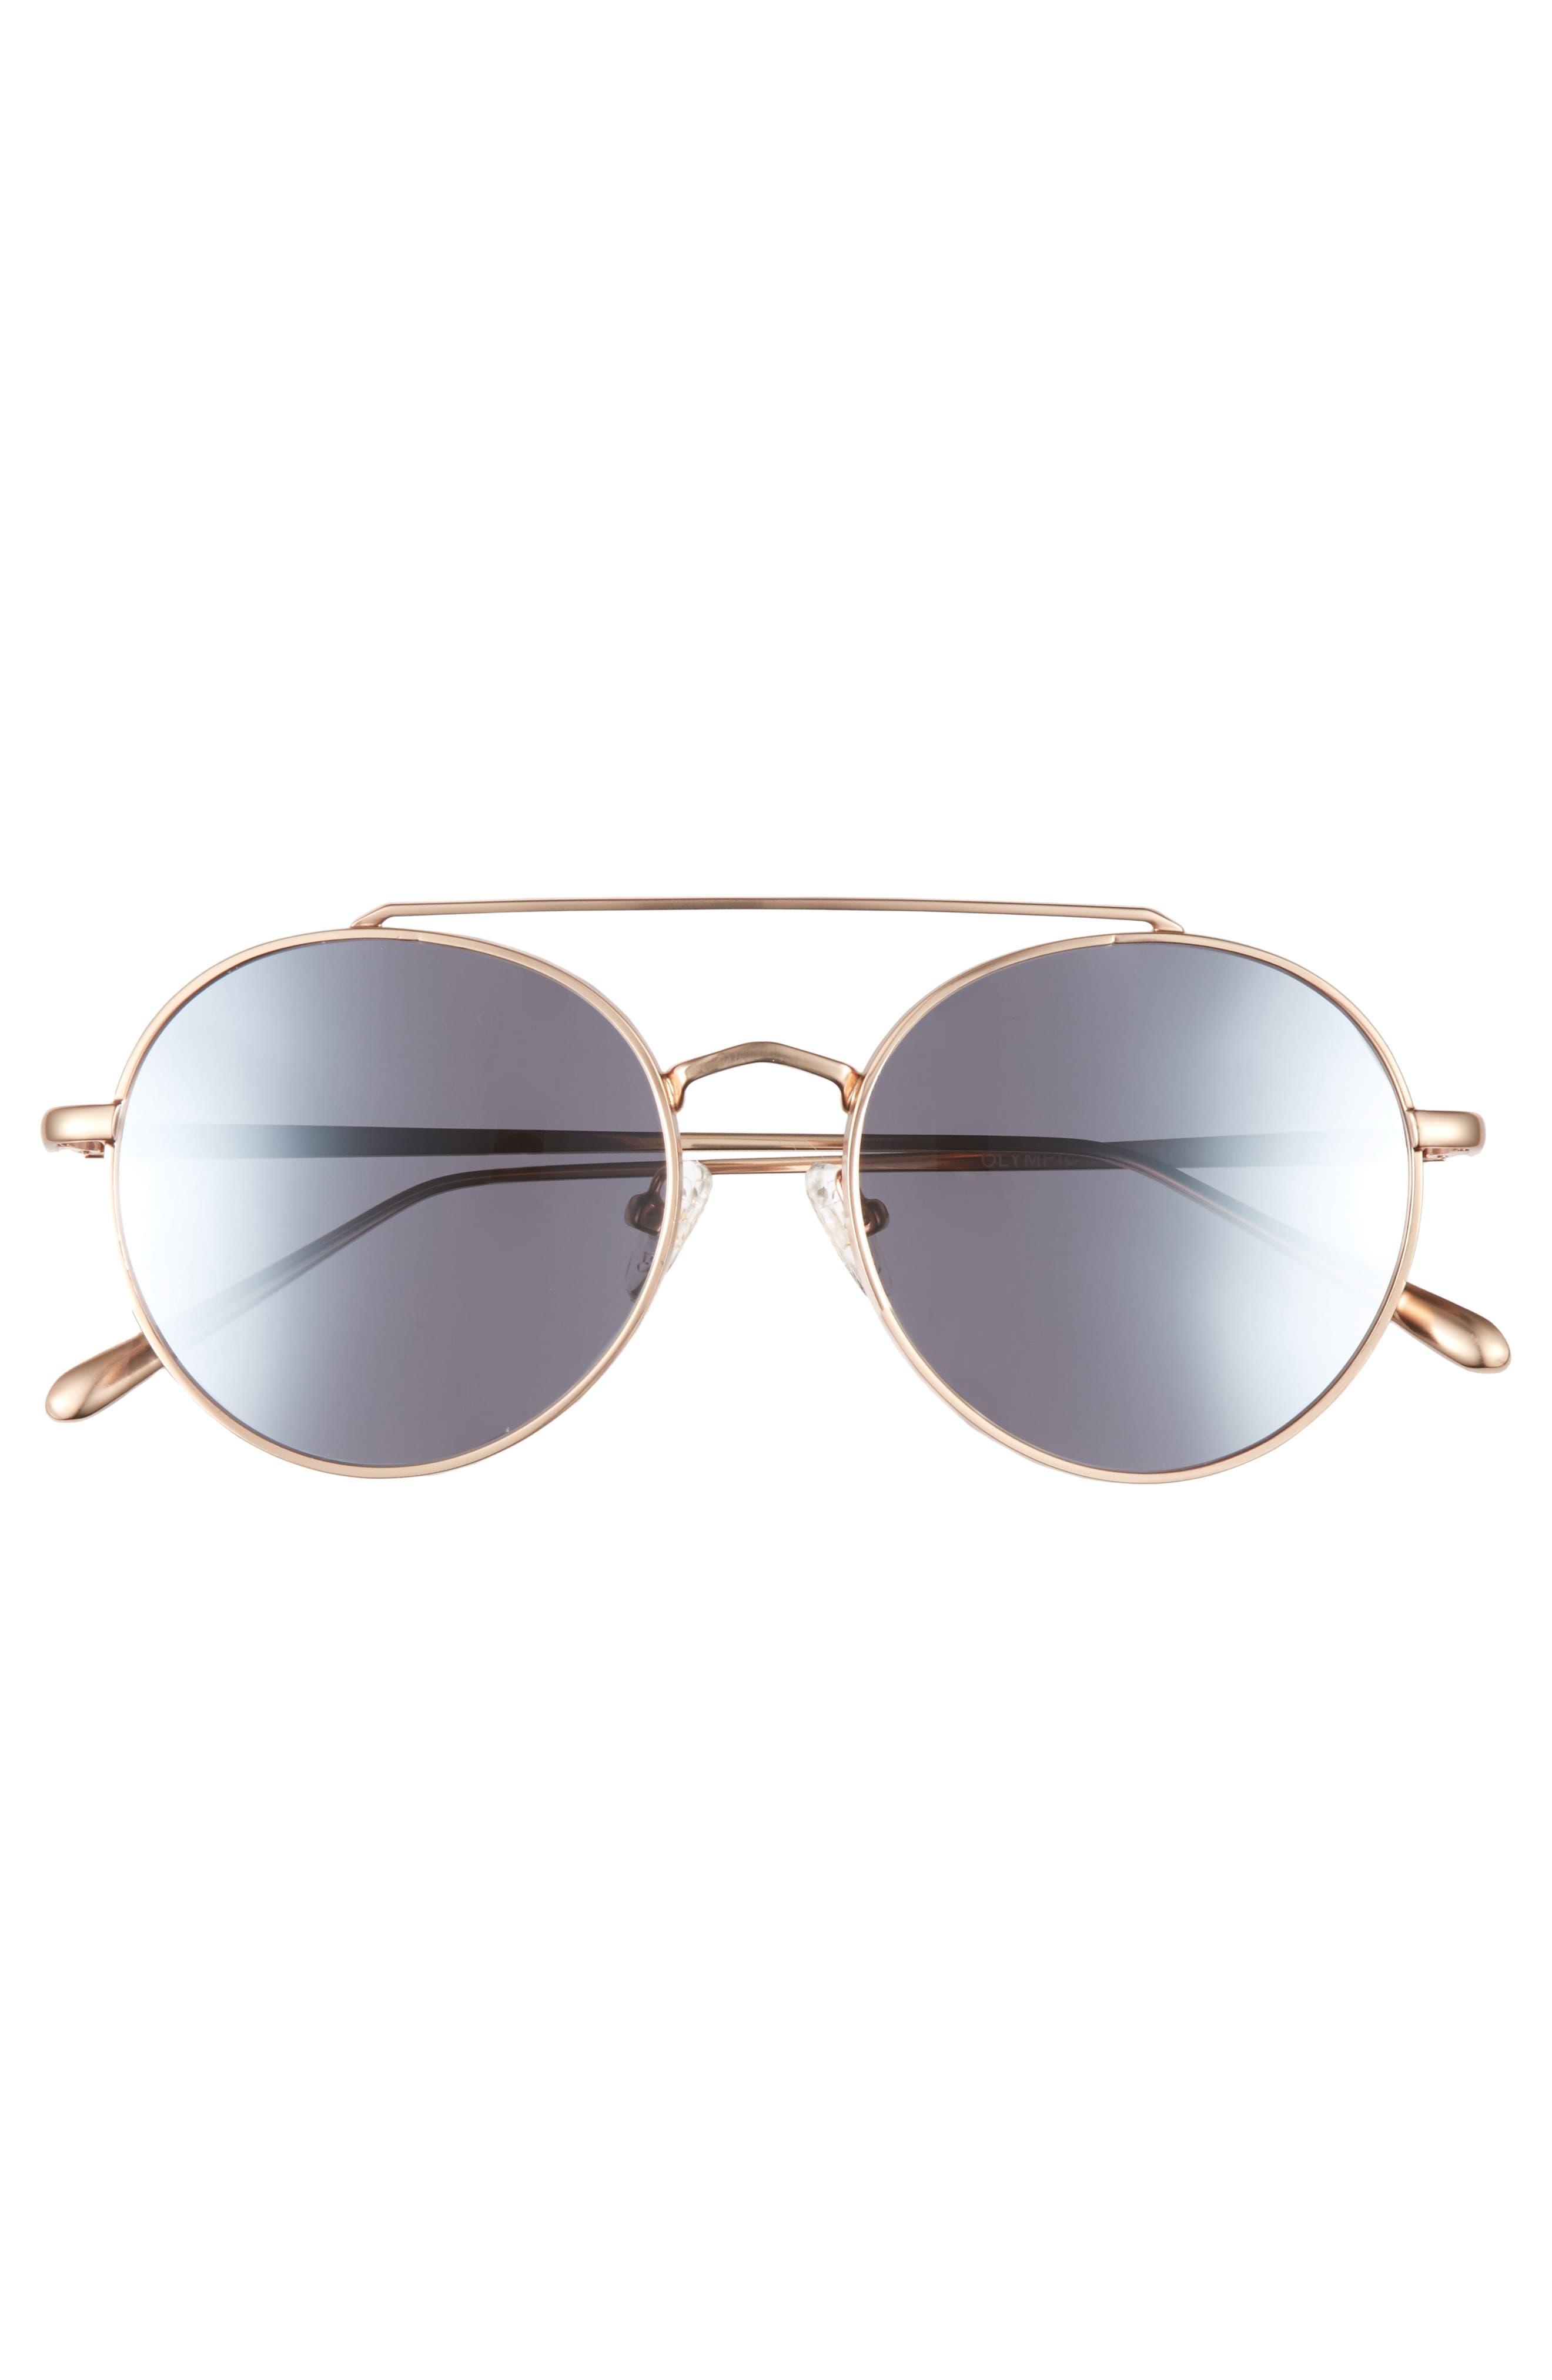 Olympic 53mm Polarized Aviator Sunglasses,                             Alternate thumbnail 5, color,                             Silver